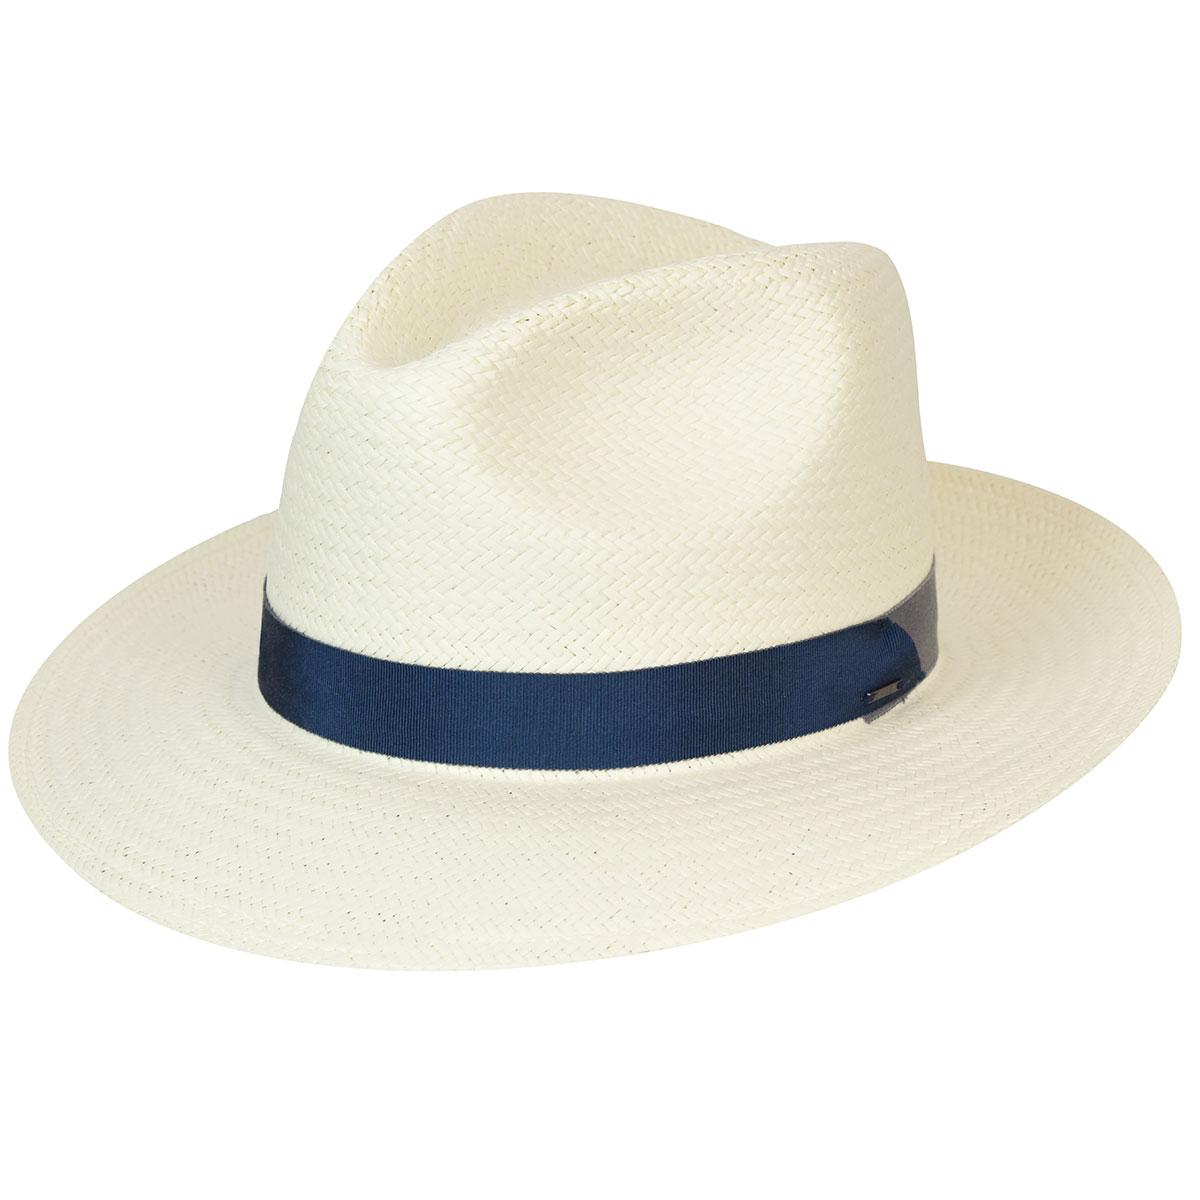 1940s Mens Hats | Fedora, Homburg, Pork Pie Hats Rothney RainduraFedora $115.00 AT vintagedancer.com